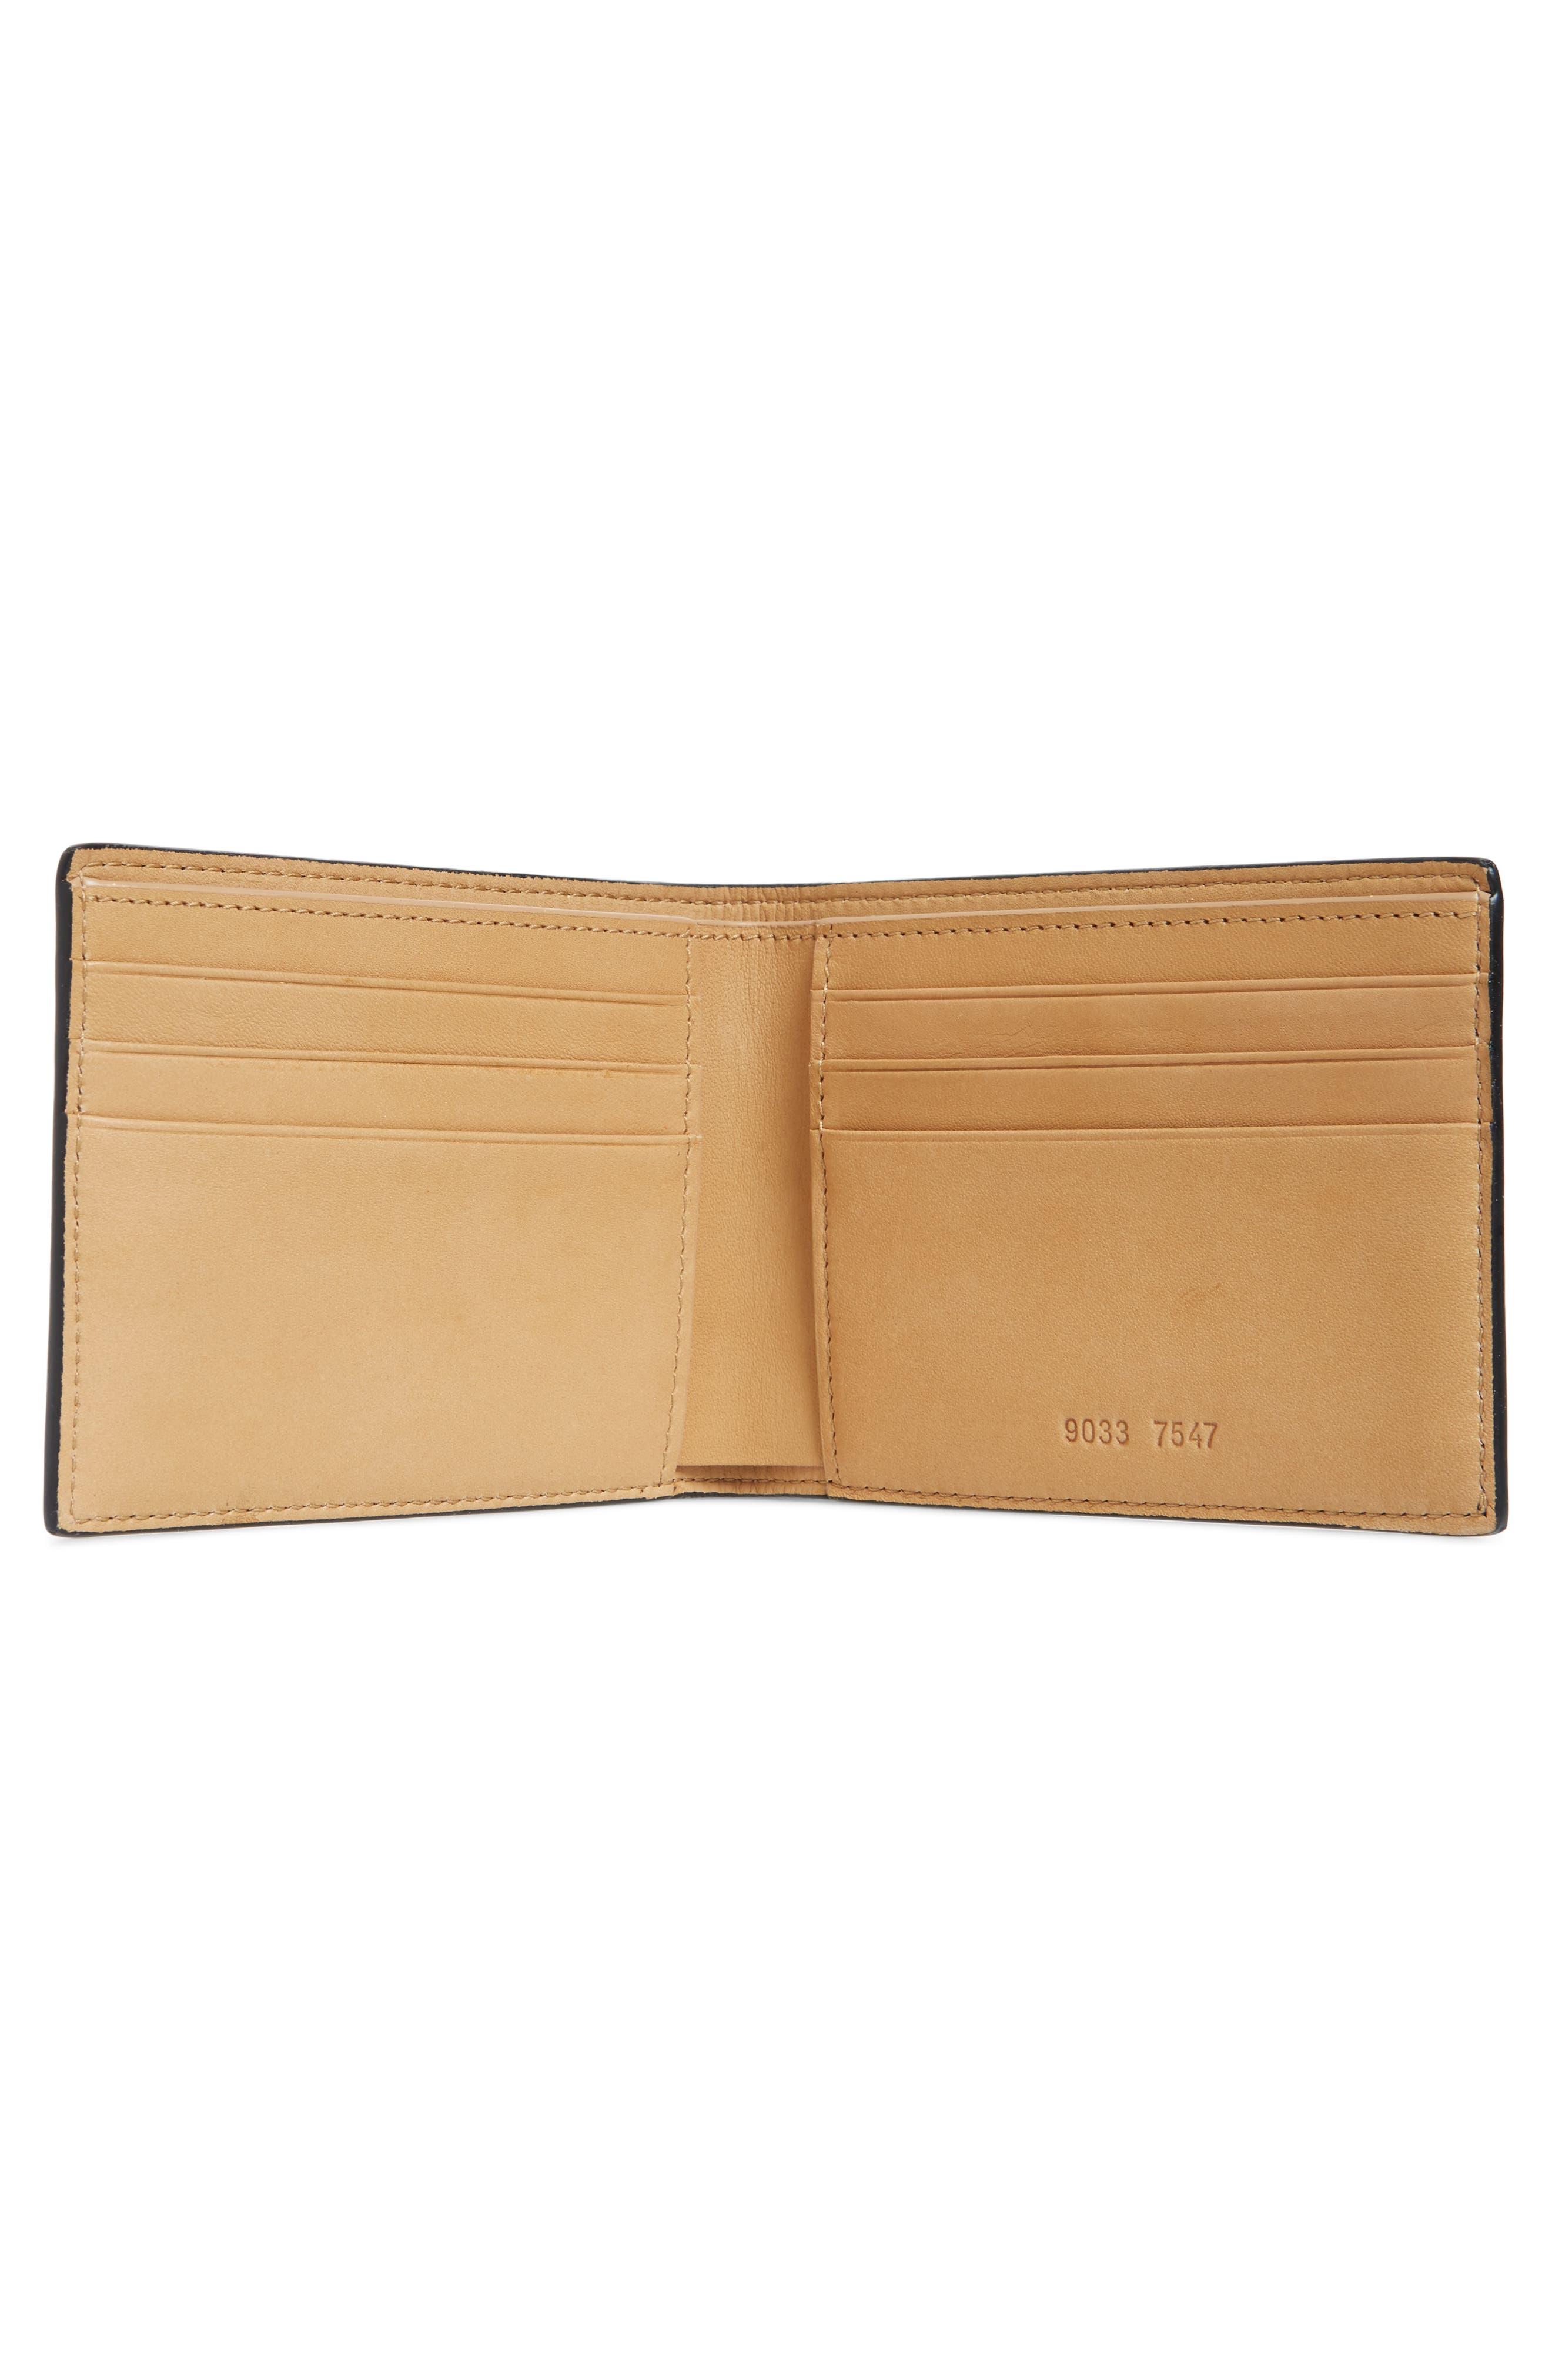 Saffiano Leather Wallet,                             Alternate thumbnail 2, color,                             BLACK